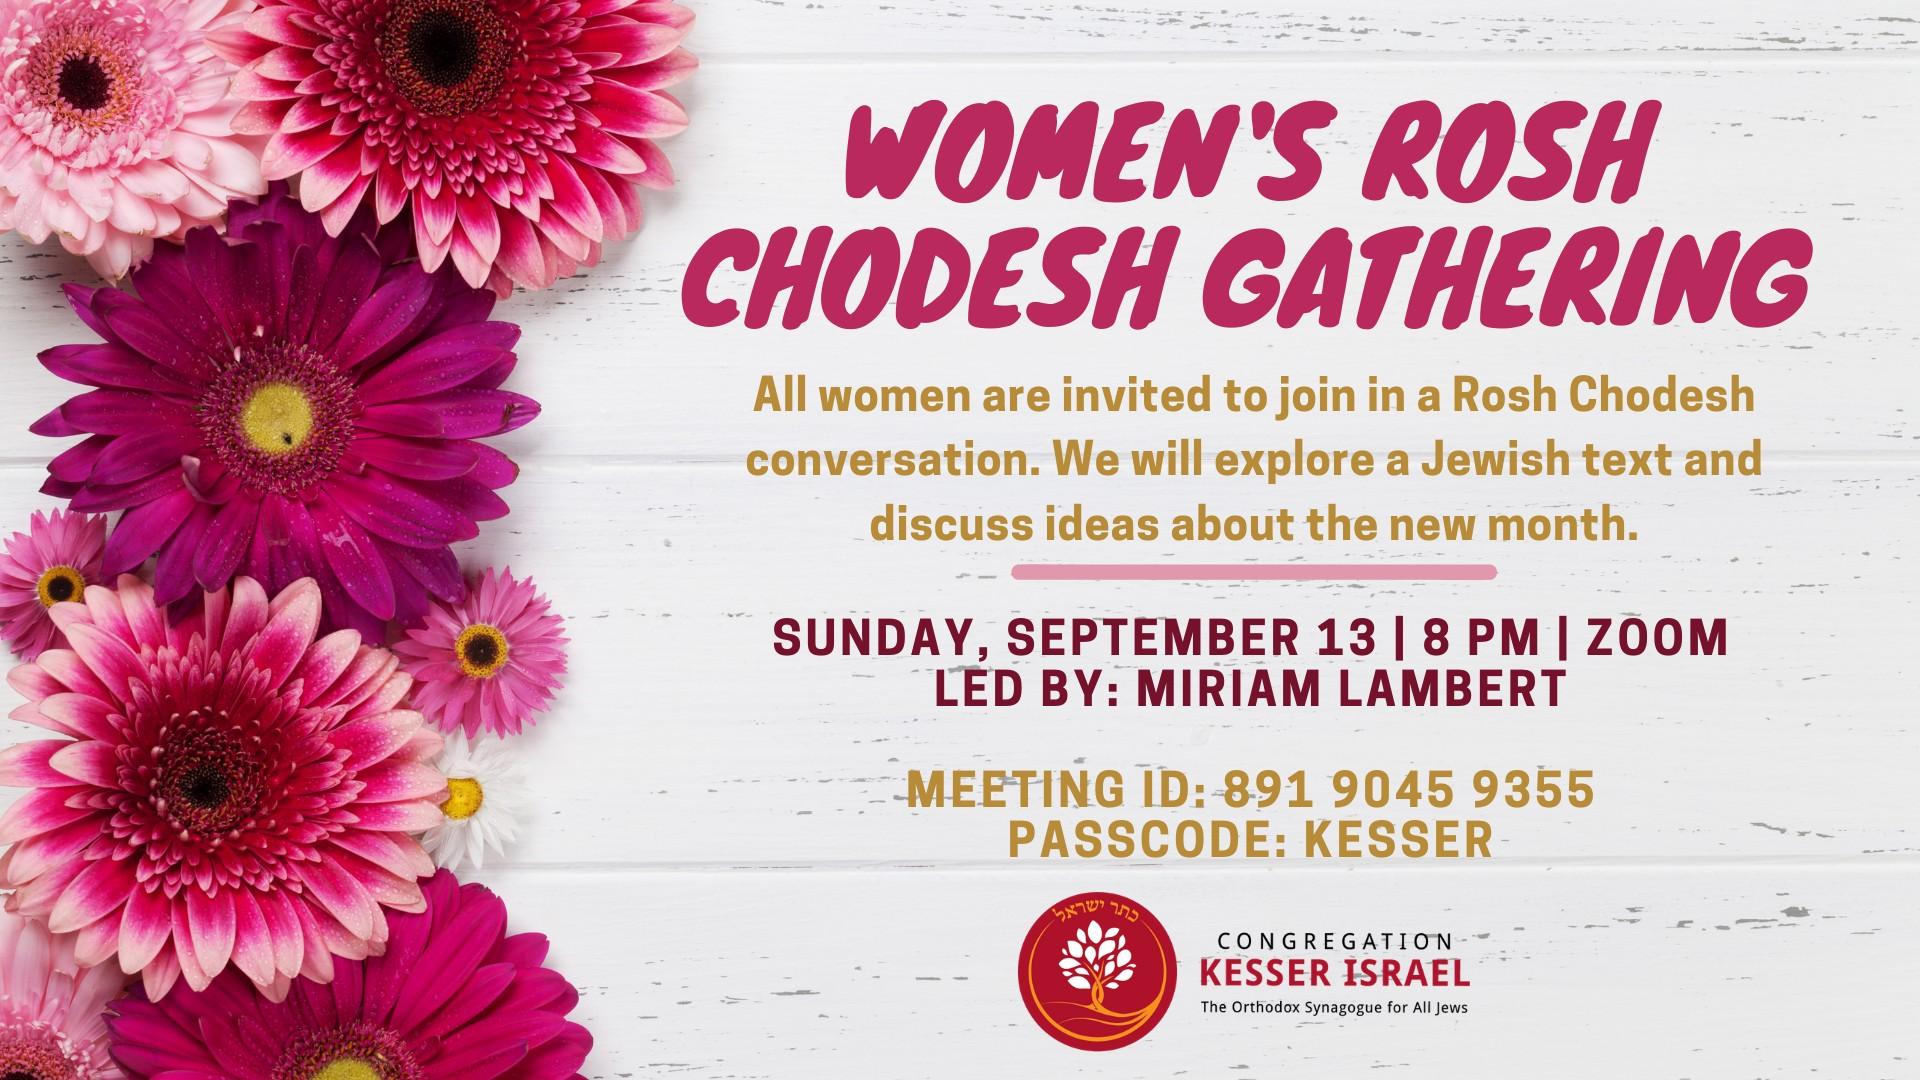 Banner Image for Women's Rosh Chodesh Gathering